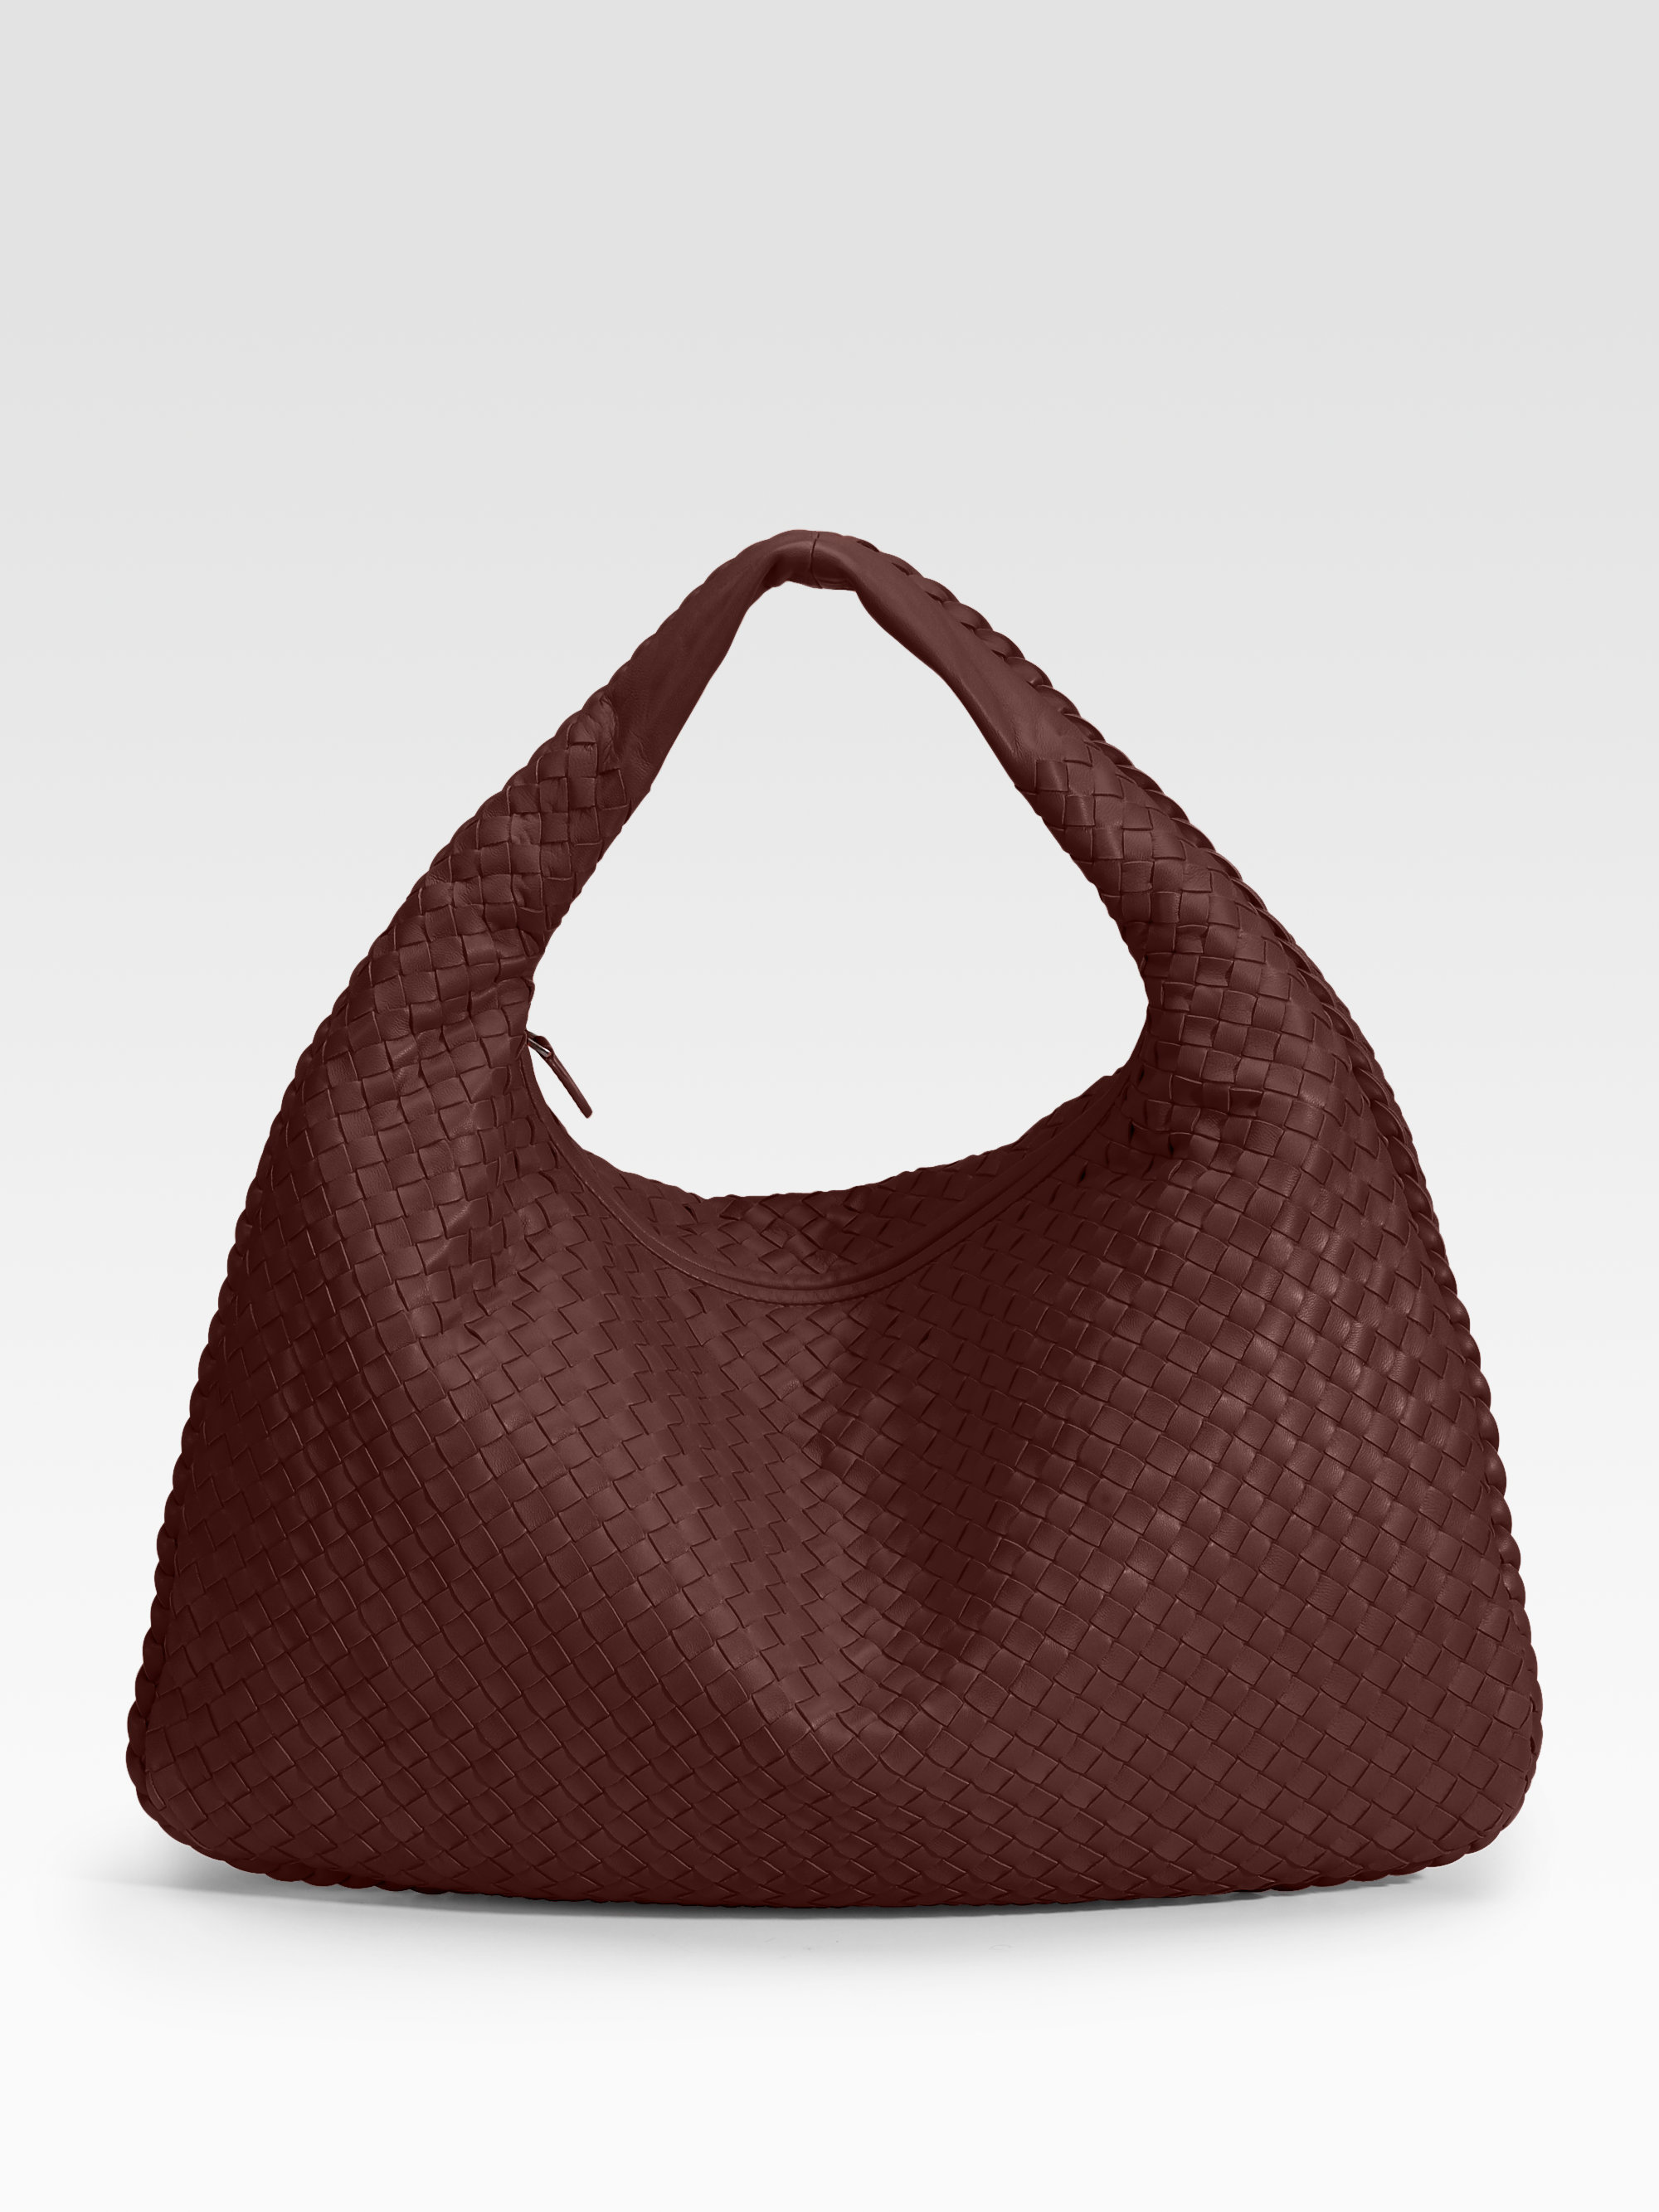 a9c4632bd343 Lyst - Bottega veneta Large Veneta Hobo Bag in Brown